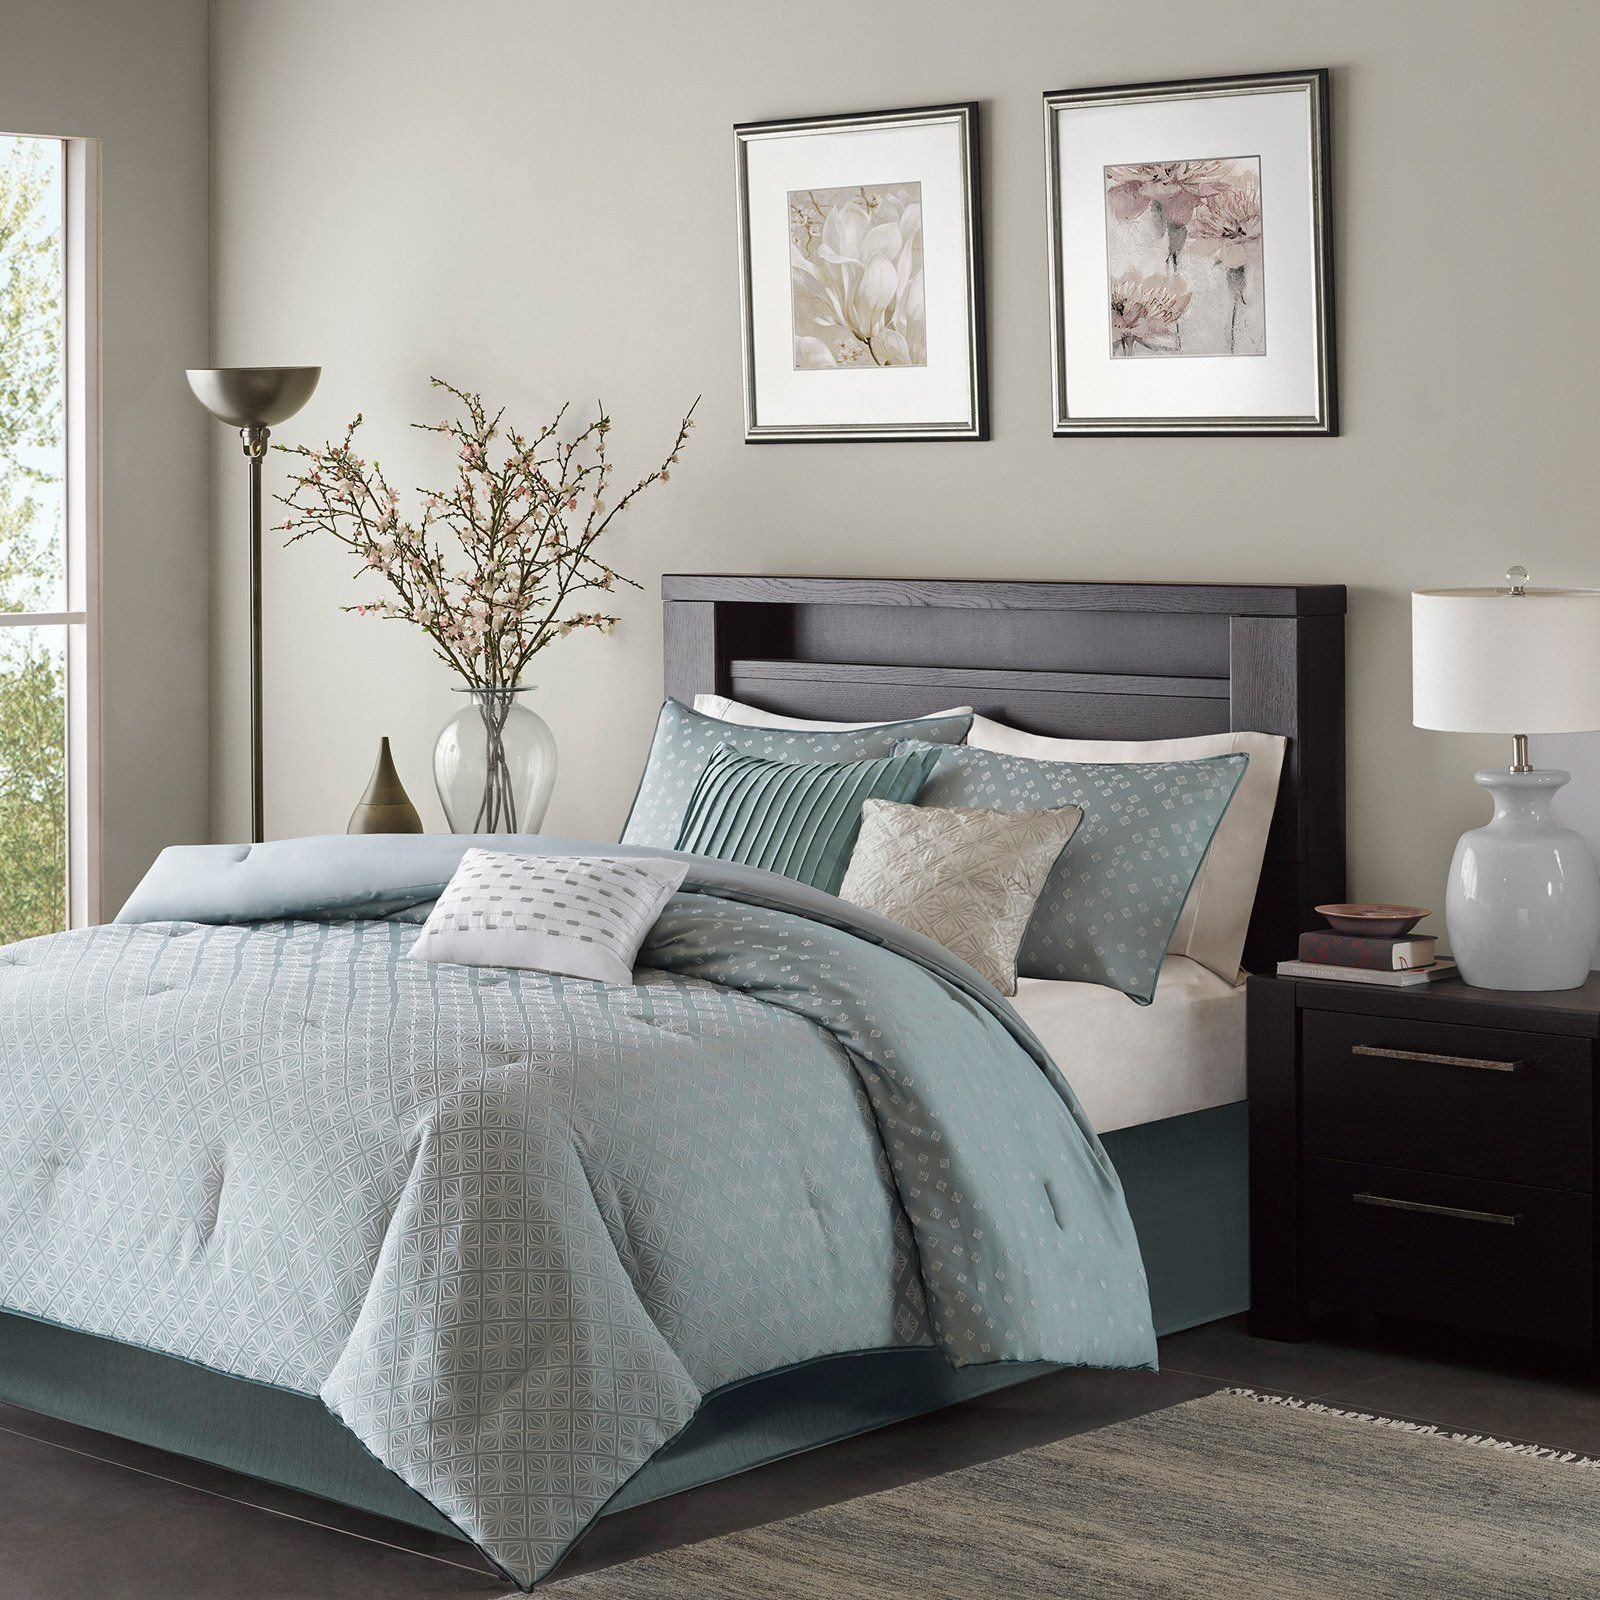 7 Piece Bedroom Set New Biloxi 7 Piece forter Set by Madison Park Blue